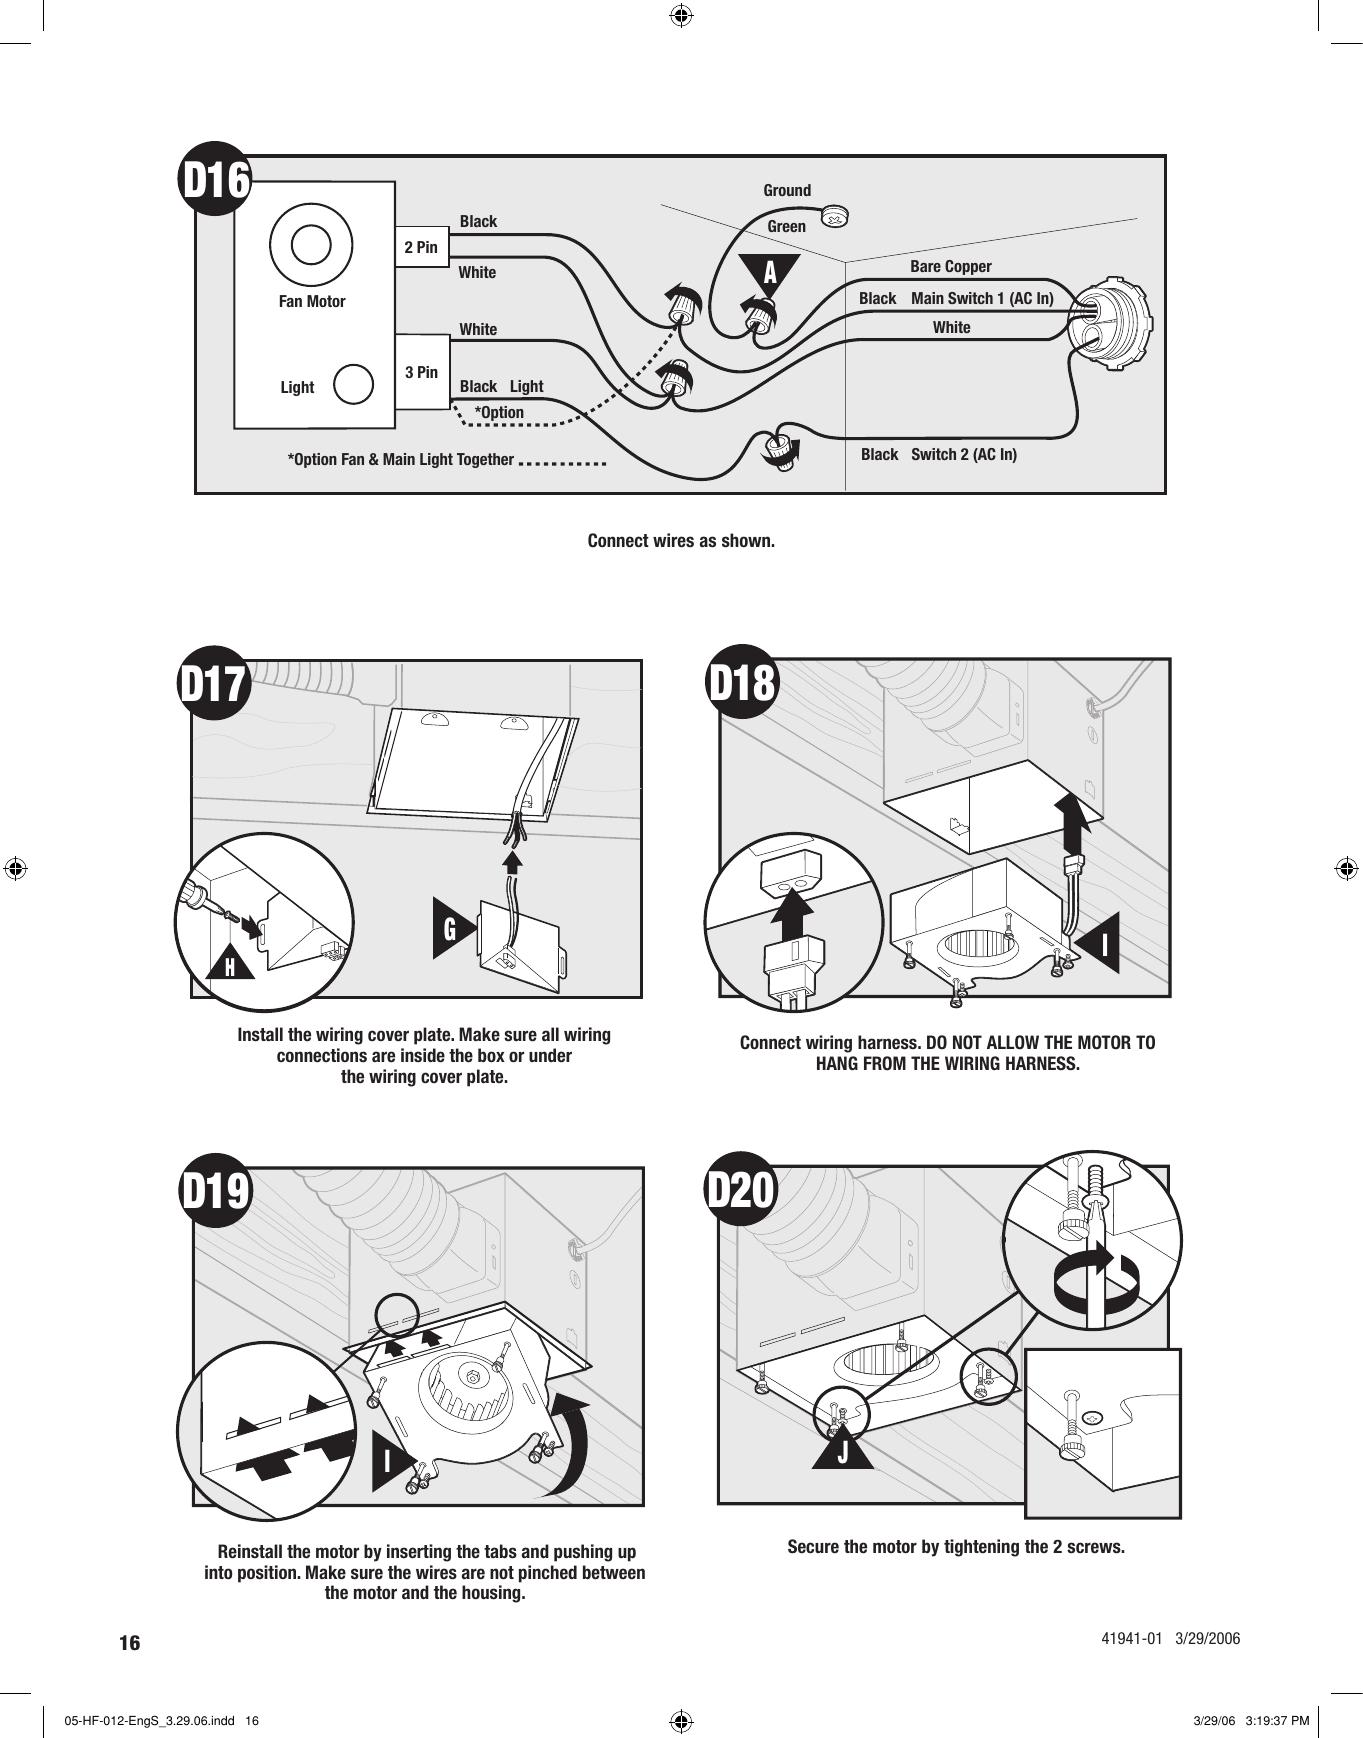 Hunter Fan Wellesley 82007 Users Manual 3 Pin Wiring Diagram 16a3 Pin2 Pinfan Motorlight Lightgreenblackblackwhiteblackblackwhitewhite Bare Coppergroundd16 Main Switch 1 Ac Inswitch 2